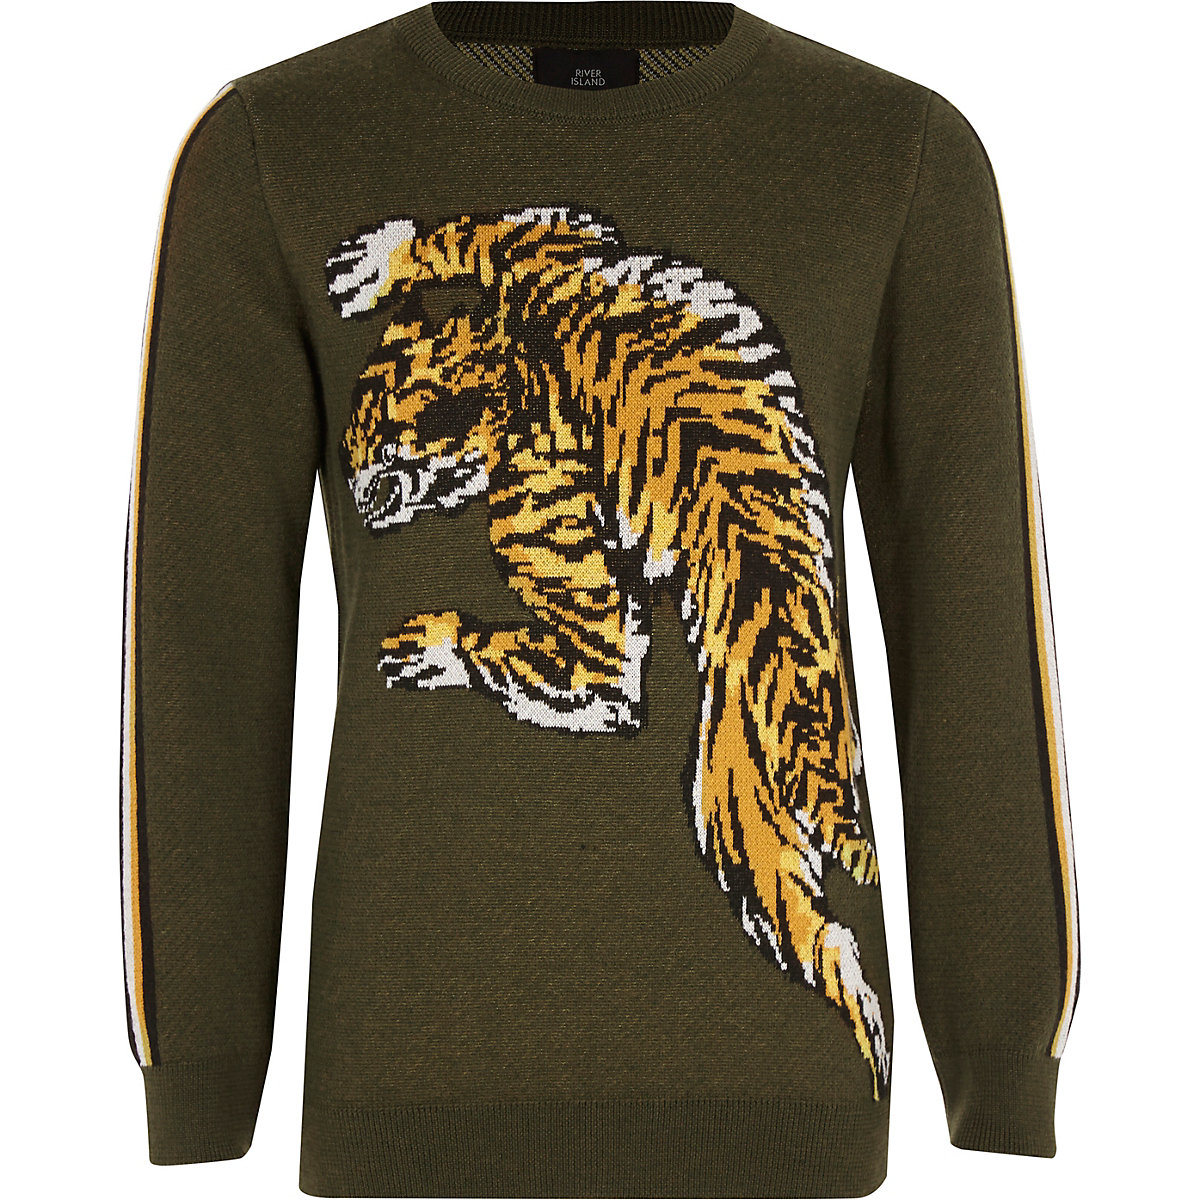 Boys khaki green tiger print sweater